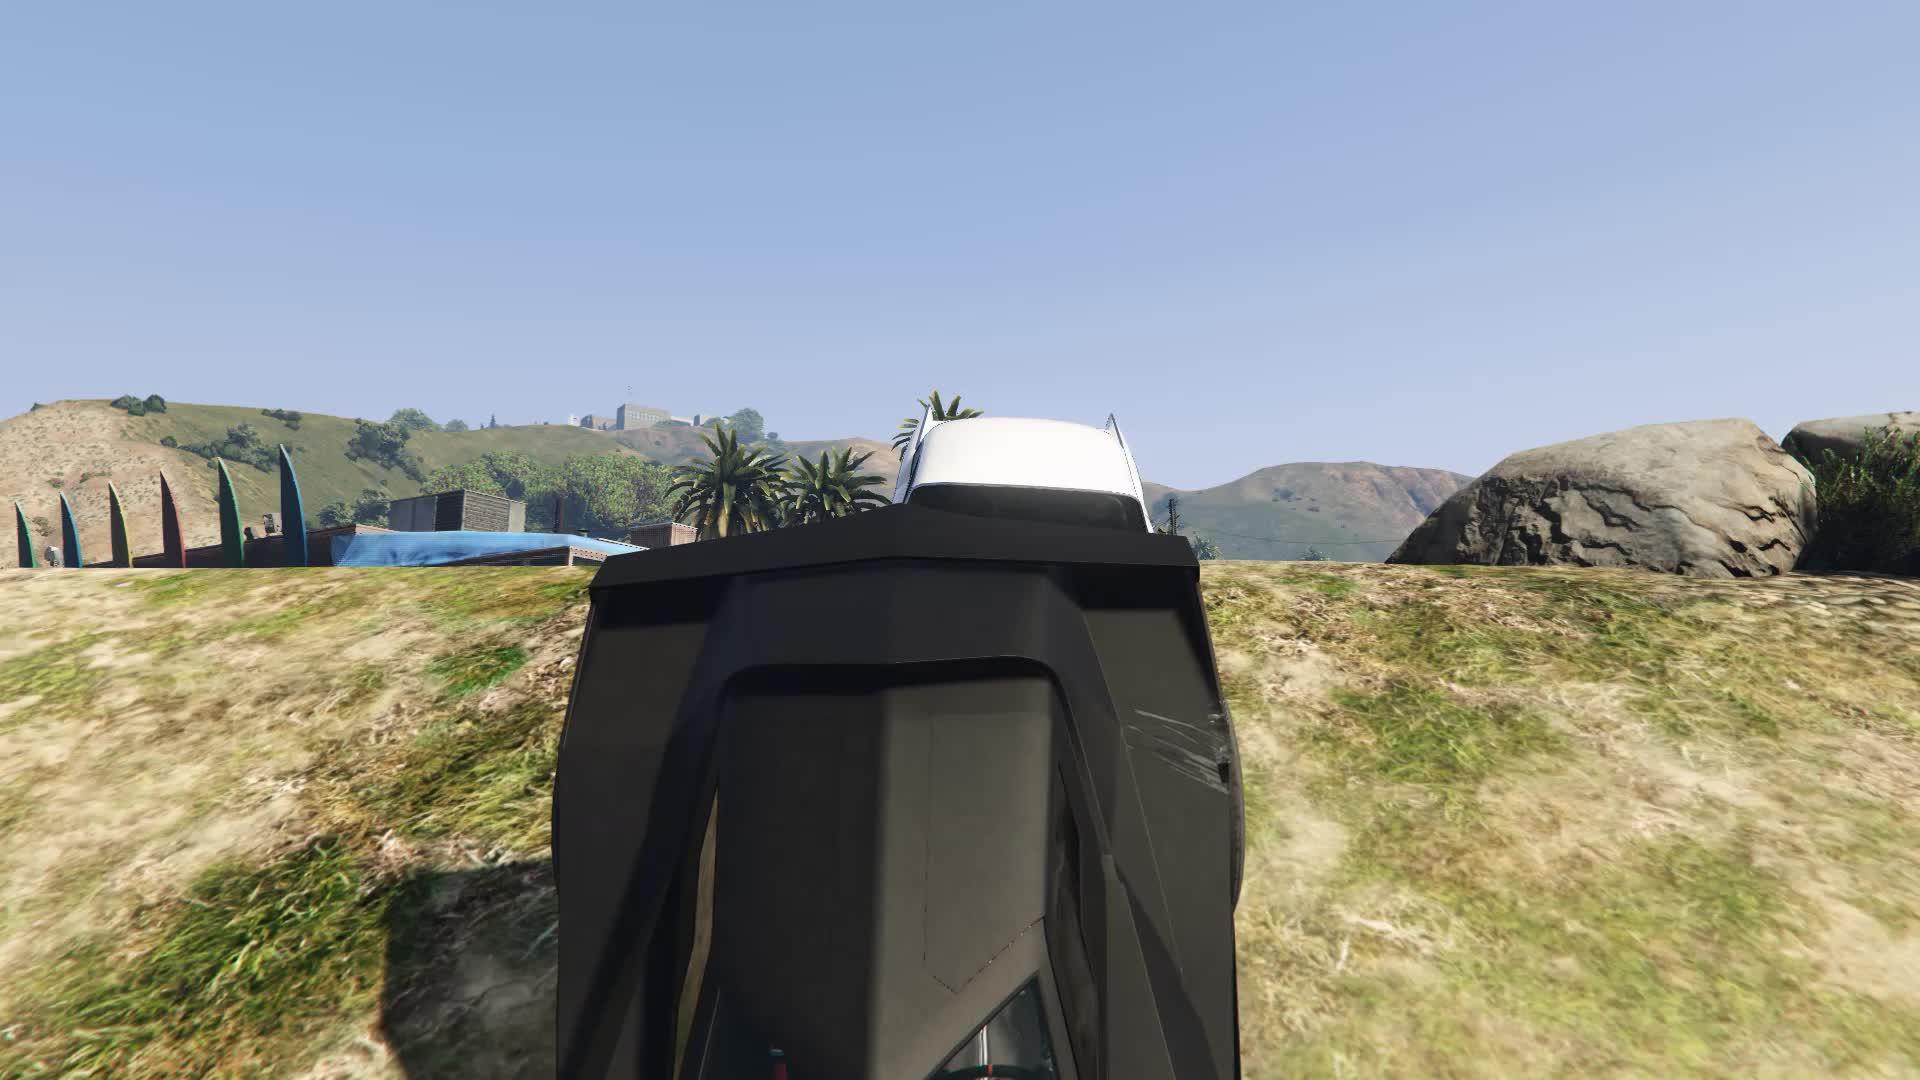 GTA Online, Vigilante, Vigilante launching GIFs